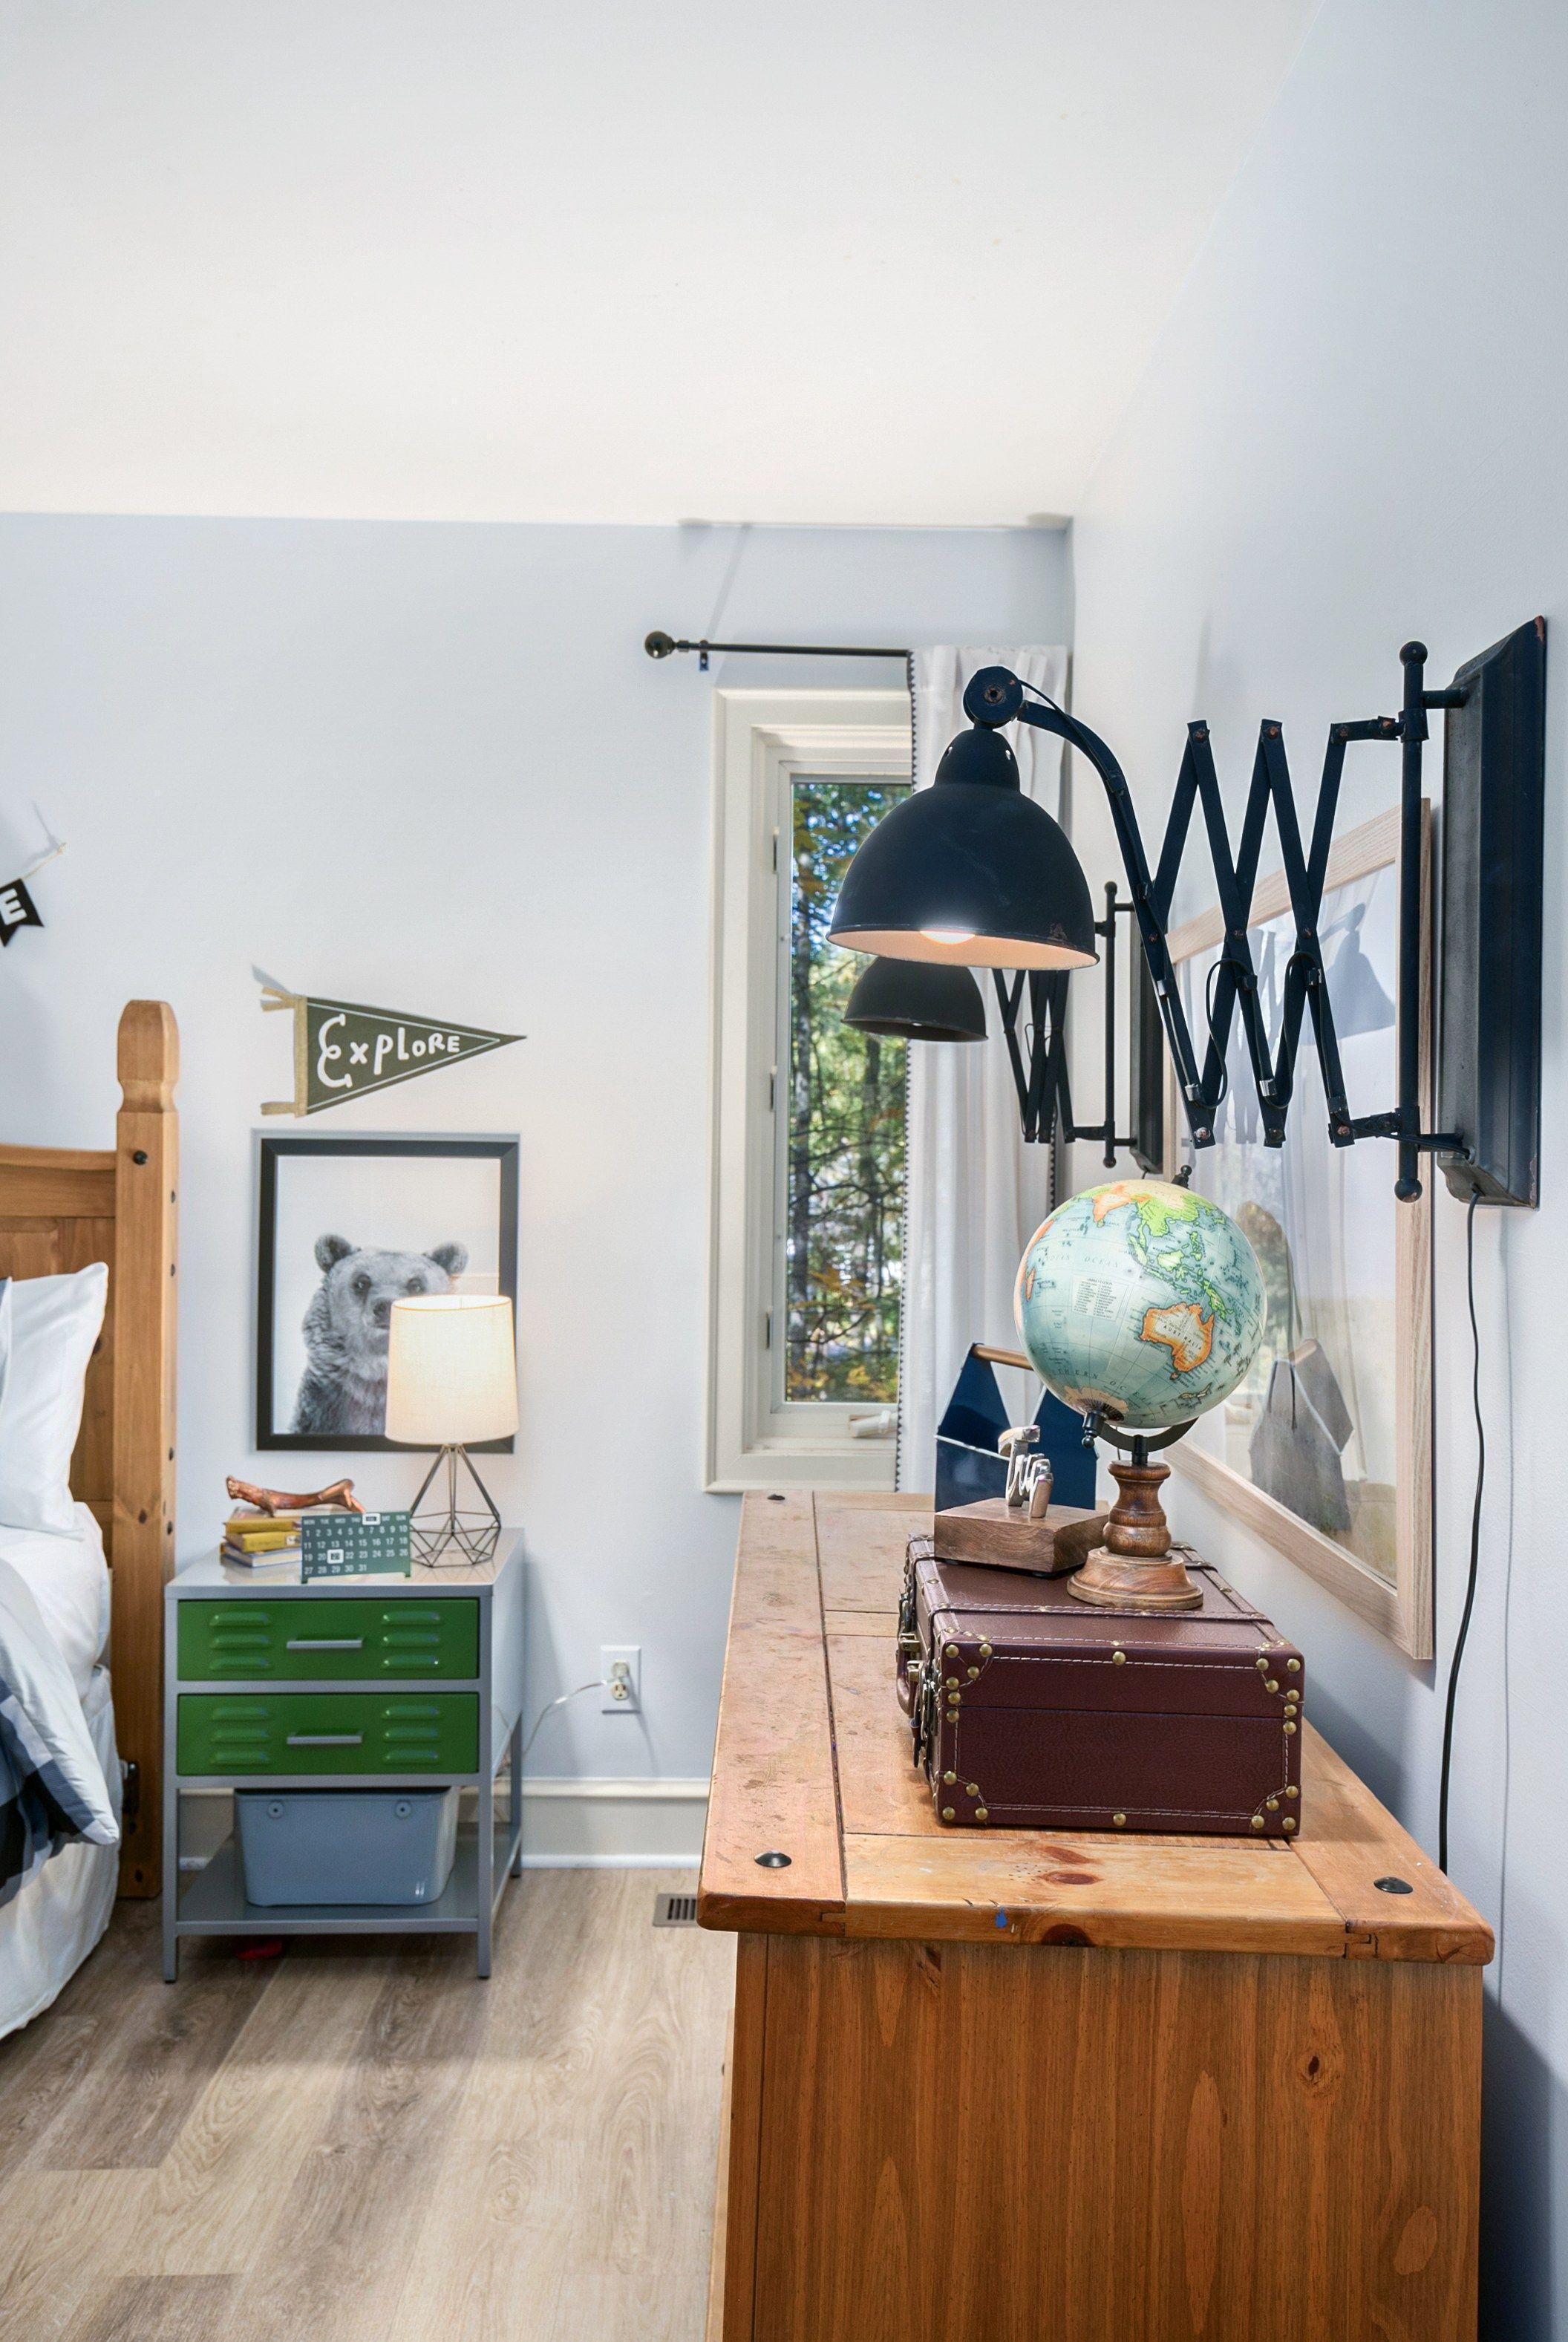 Adventure Boy S Bedroom Makeover By Postbox Designs Interior E Design For One Room Challenge Kids Decor